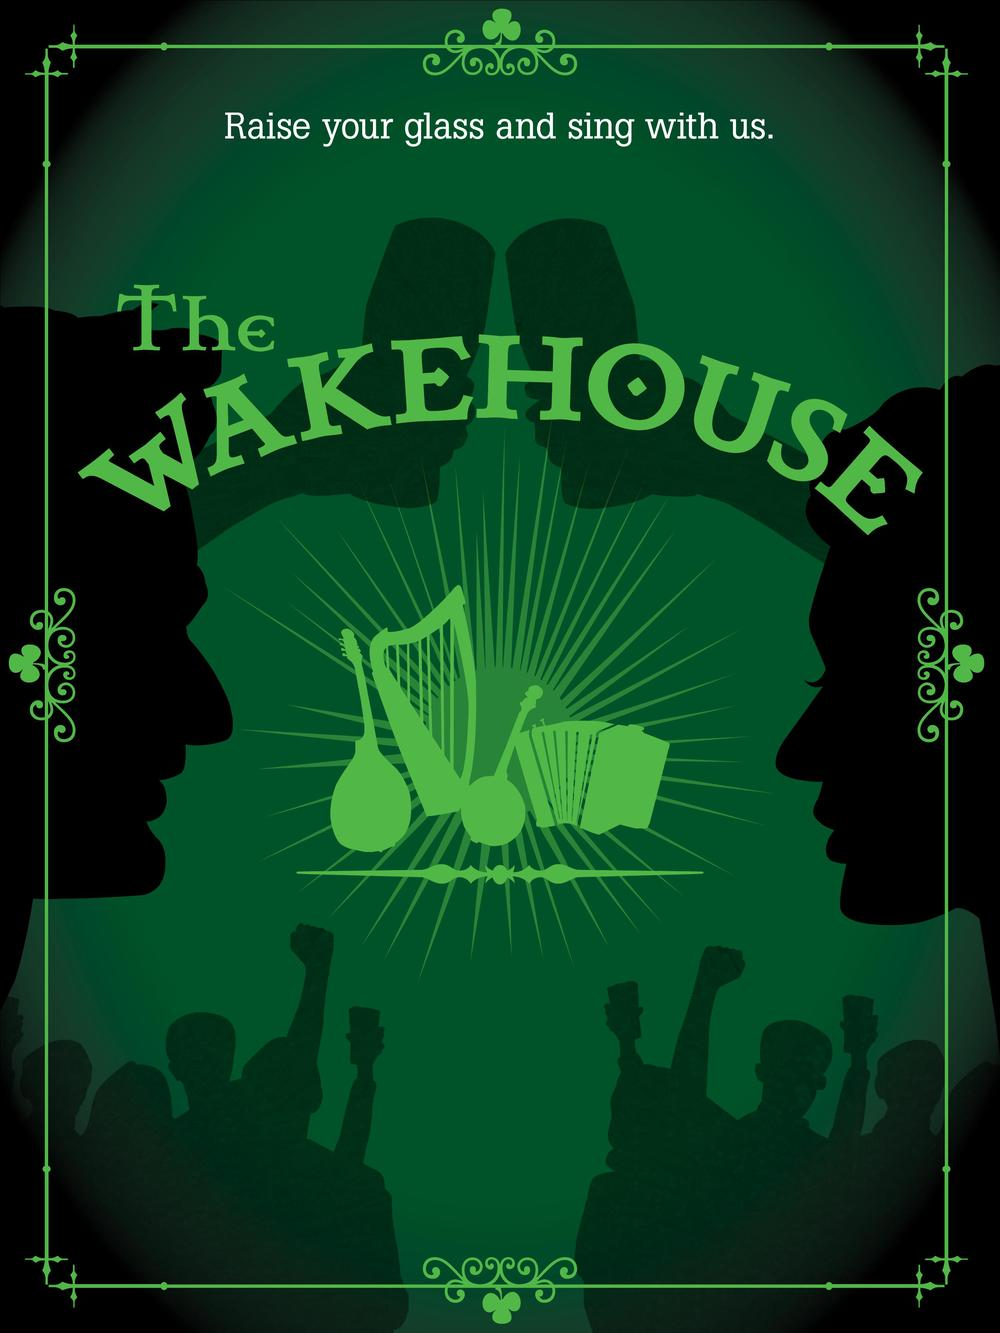 The Wakehouse_000001.jpg